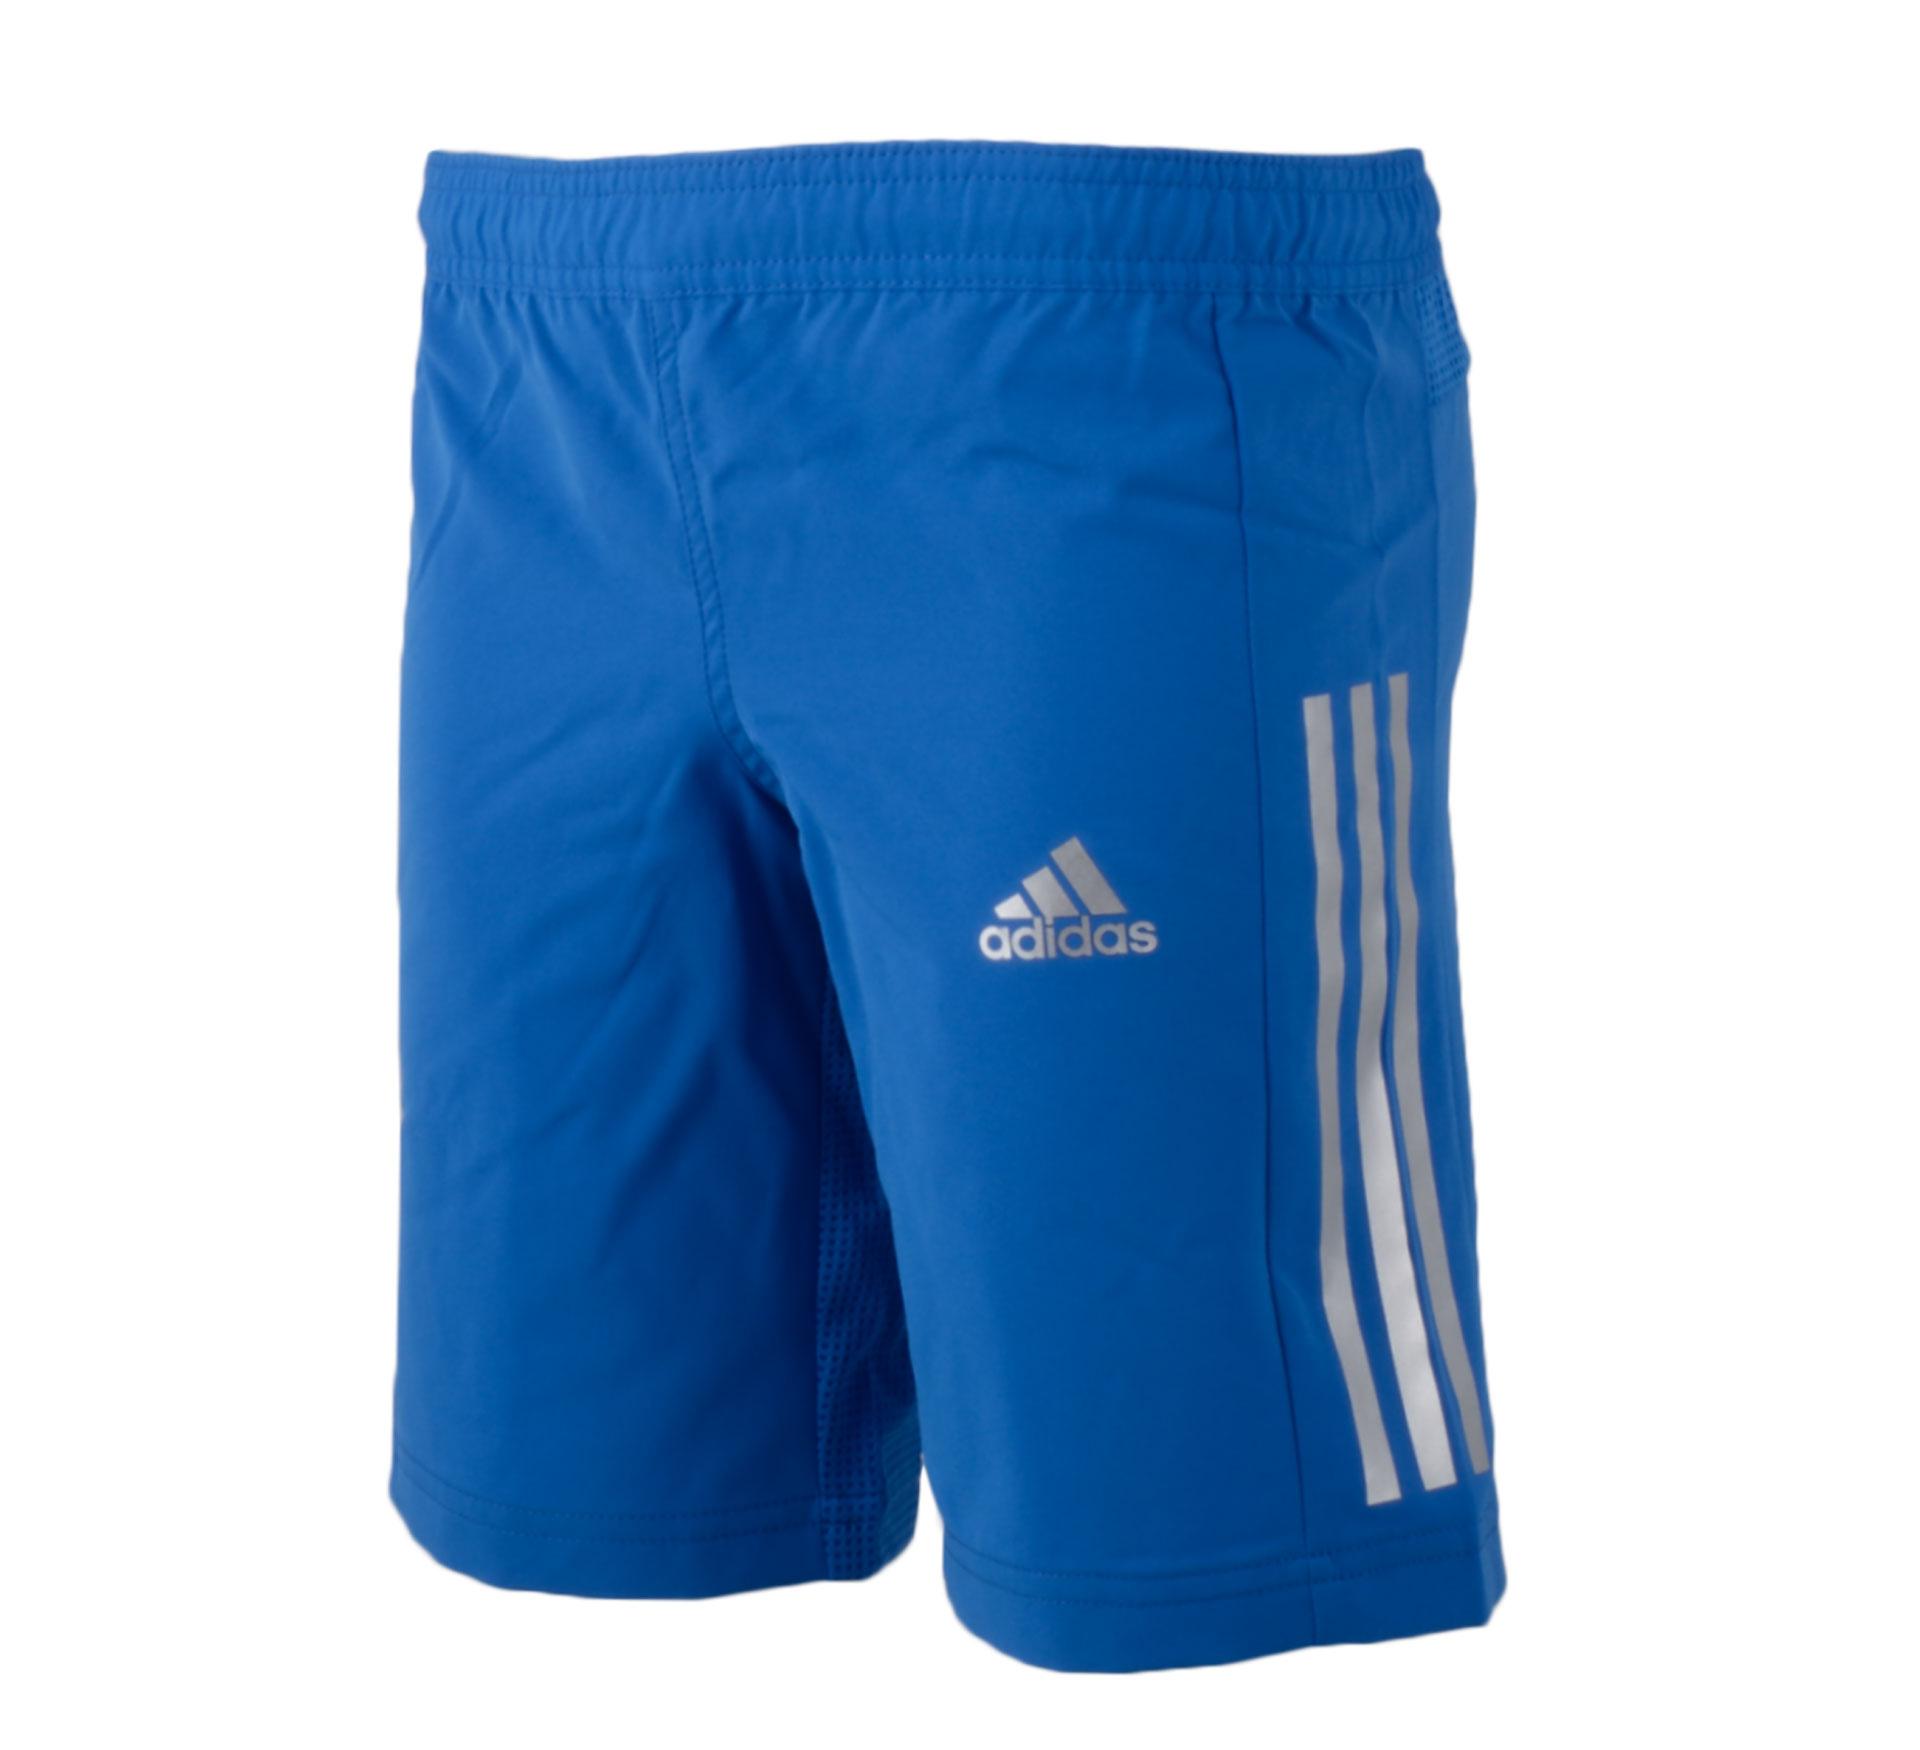 Adidas Training Short Junior blauw - zilver